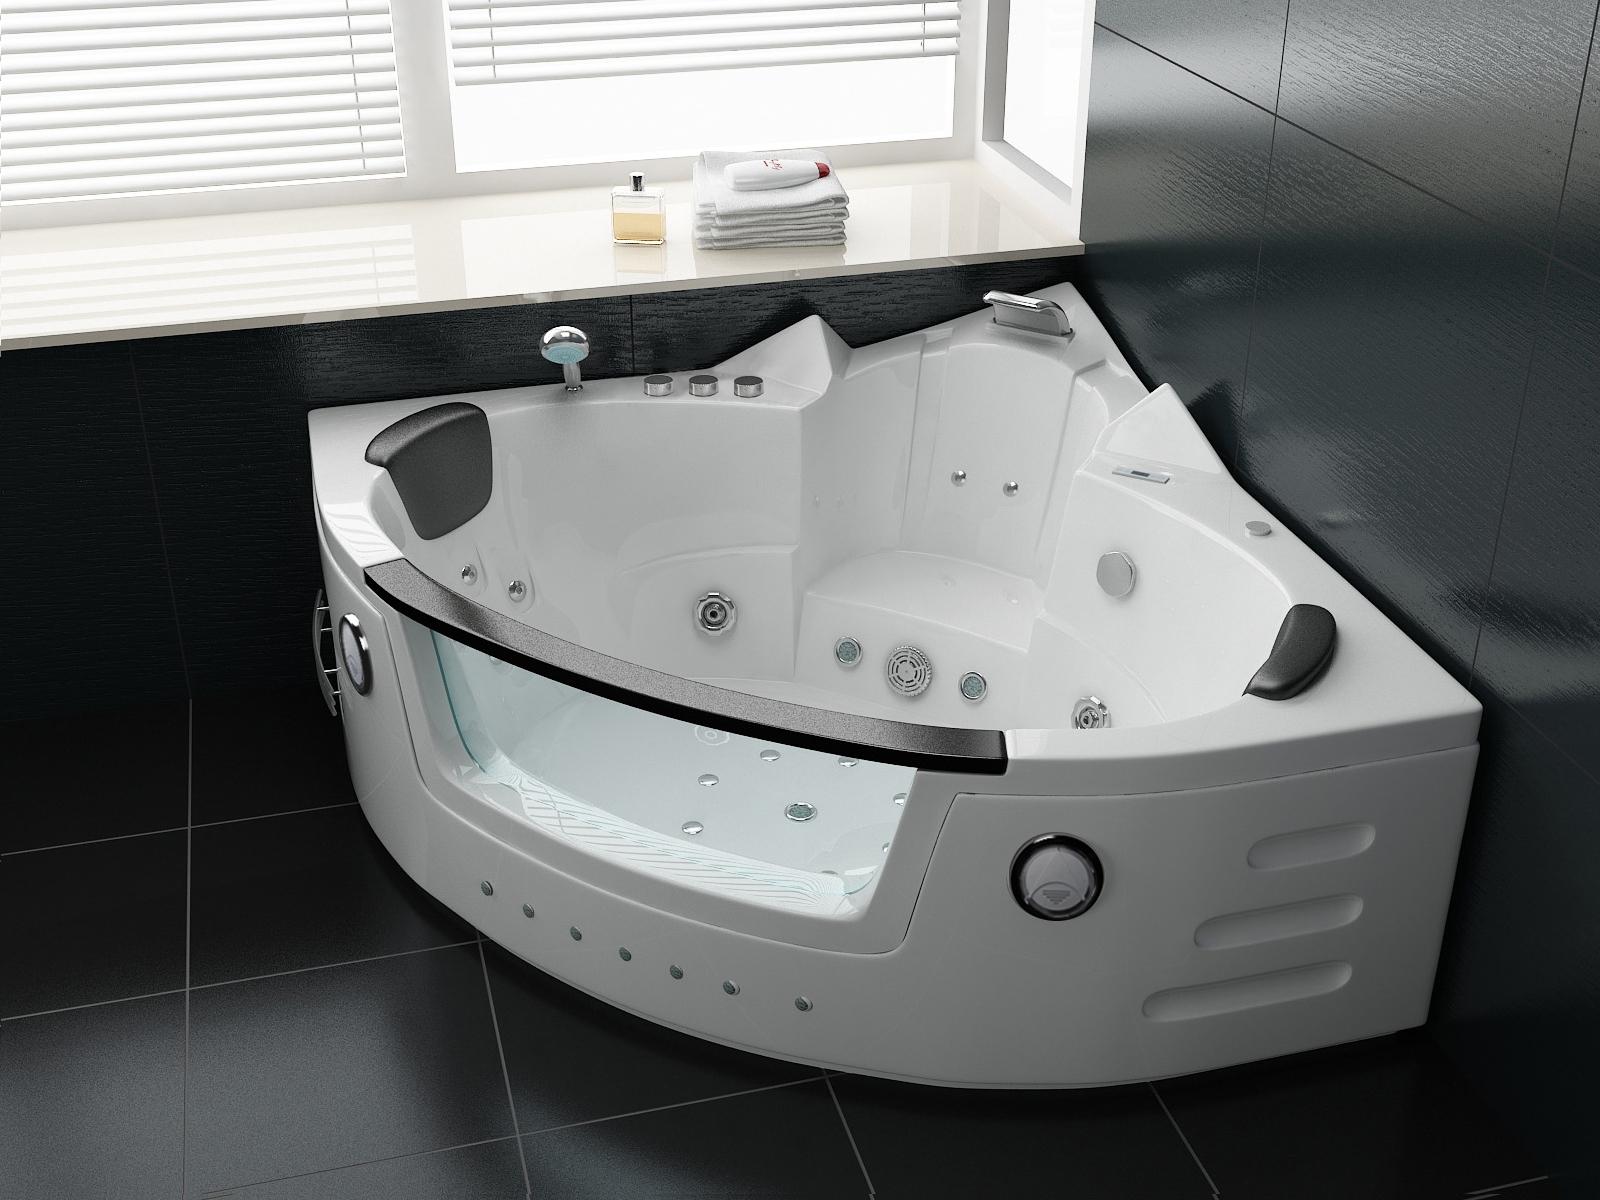 whirlpool badewanne stream 140 x 140 cm duschdeals. Black Bedroom Furniture Sets. Home Design Ideas